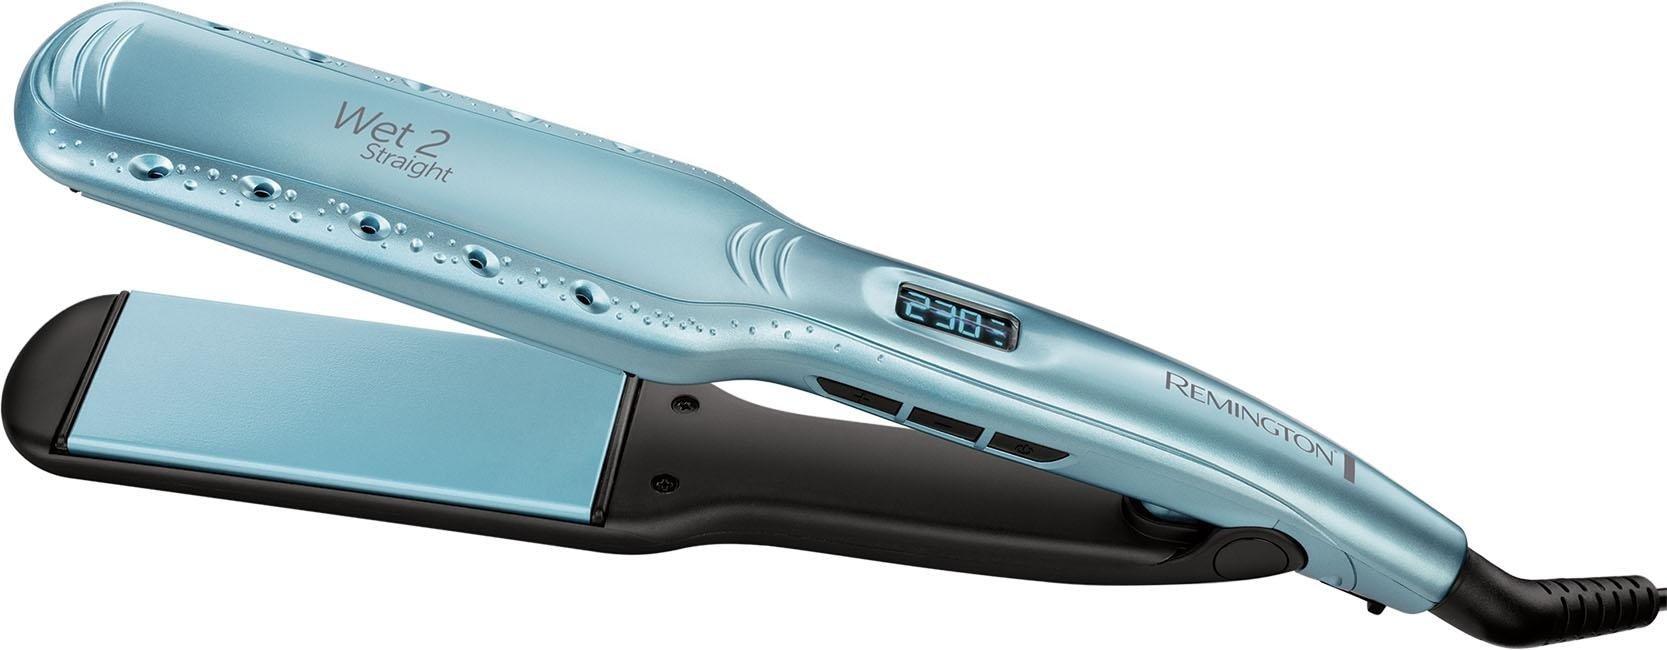 Remington Glätteisen S7350 Breiter Wet2Straight Haarglätter Keramik-Beschichtung